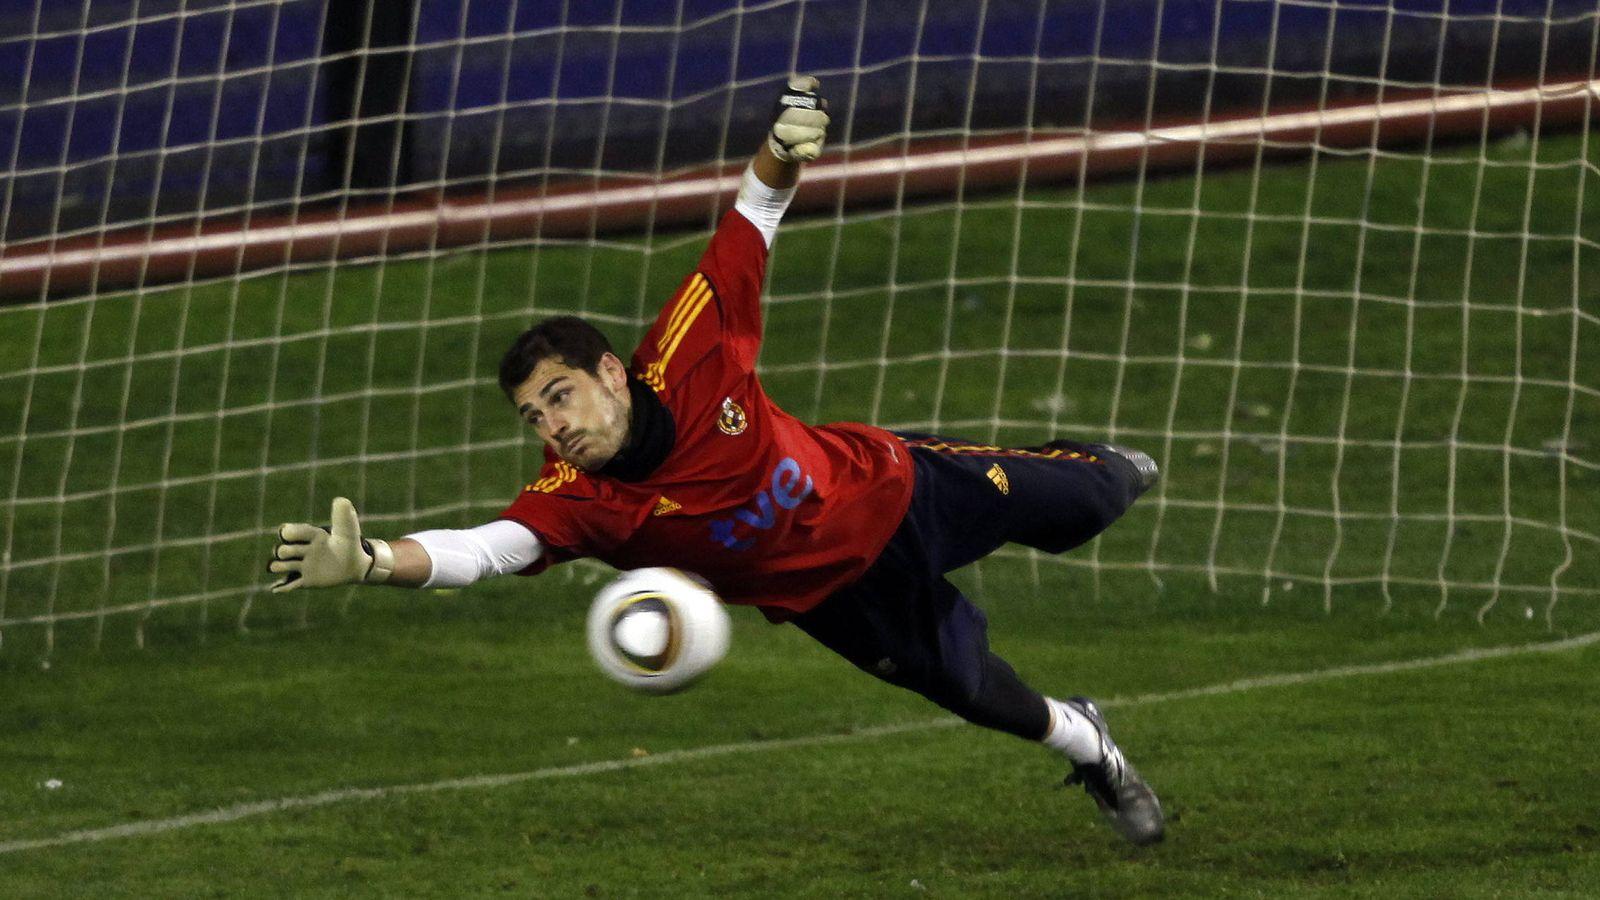 0d5e21fcd0c Selección Española de Fútbol: La selección española dice adiós a Casillas,  capitán de su época dorada